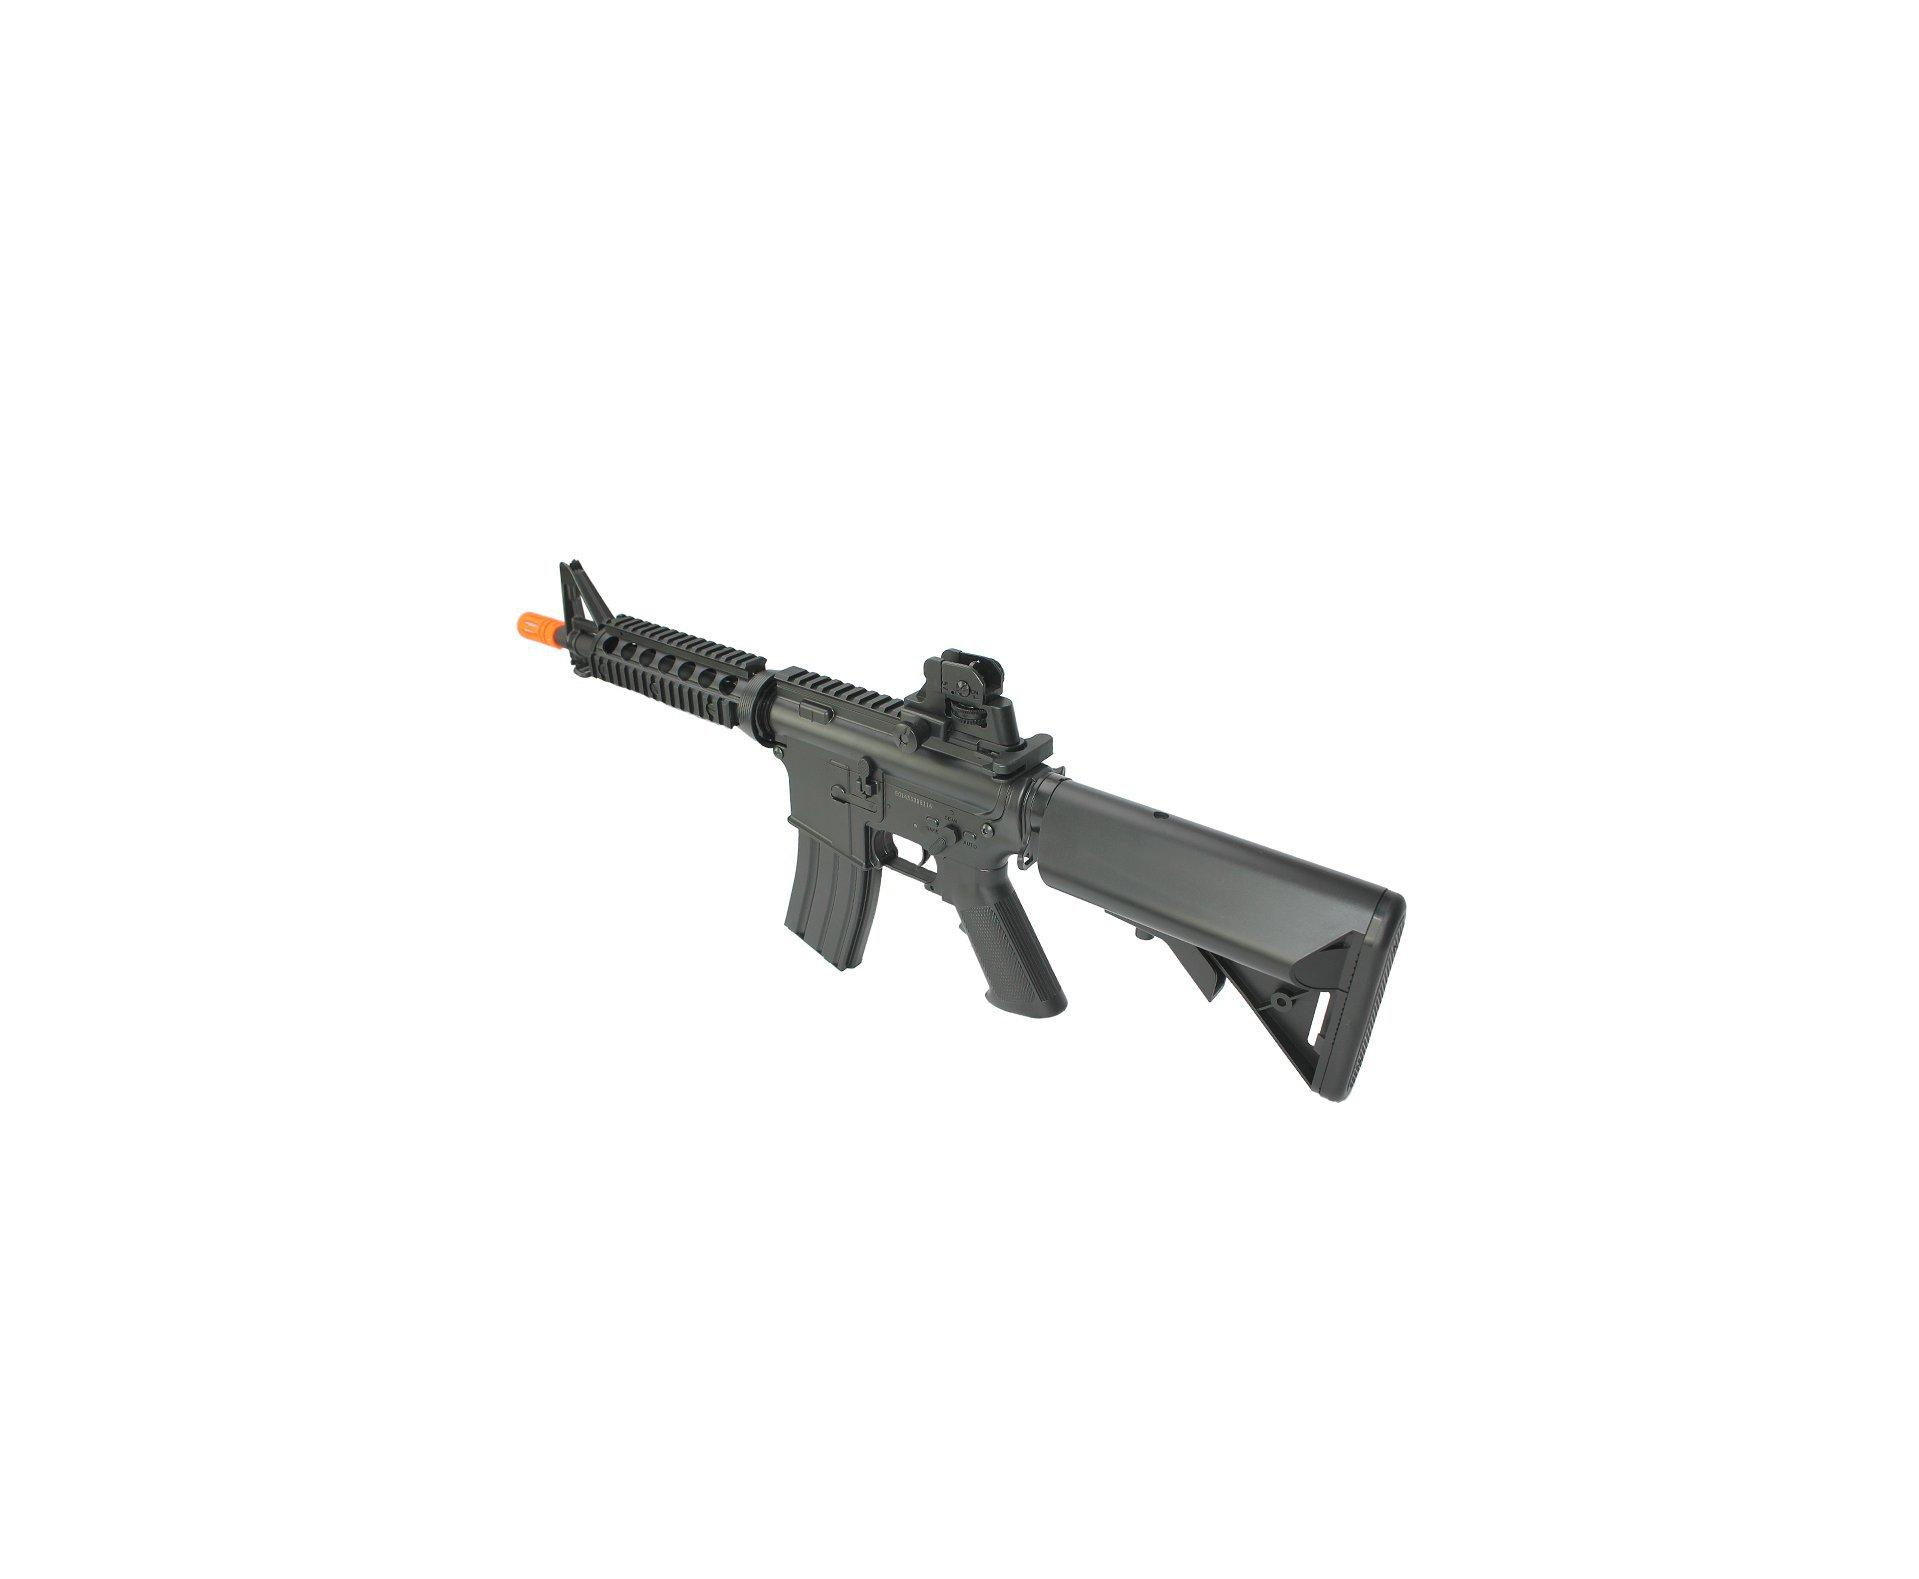 Rifle De Airsoft M4a1 Cqb Ris Cal 6mm - Eletrico Bivolt Cm506 - Cyma